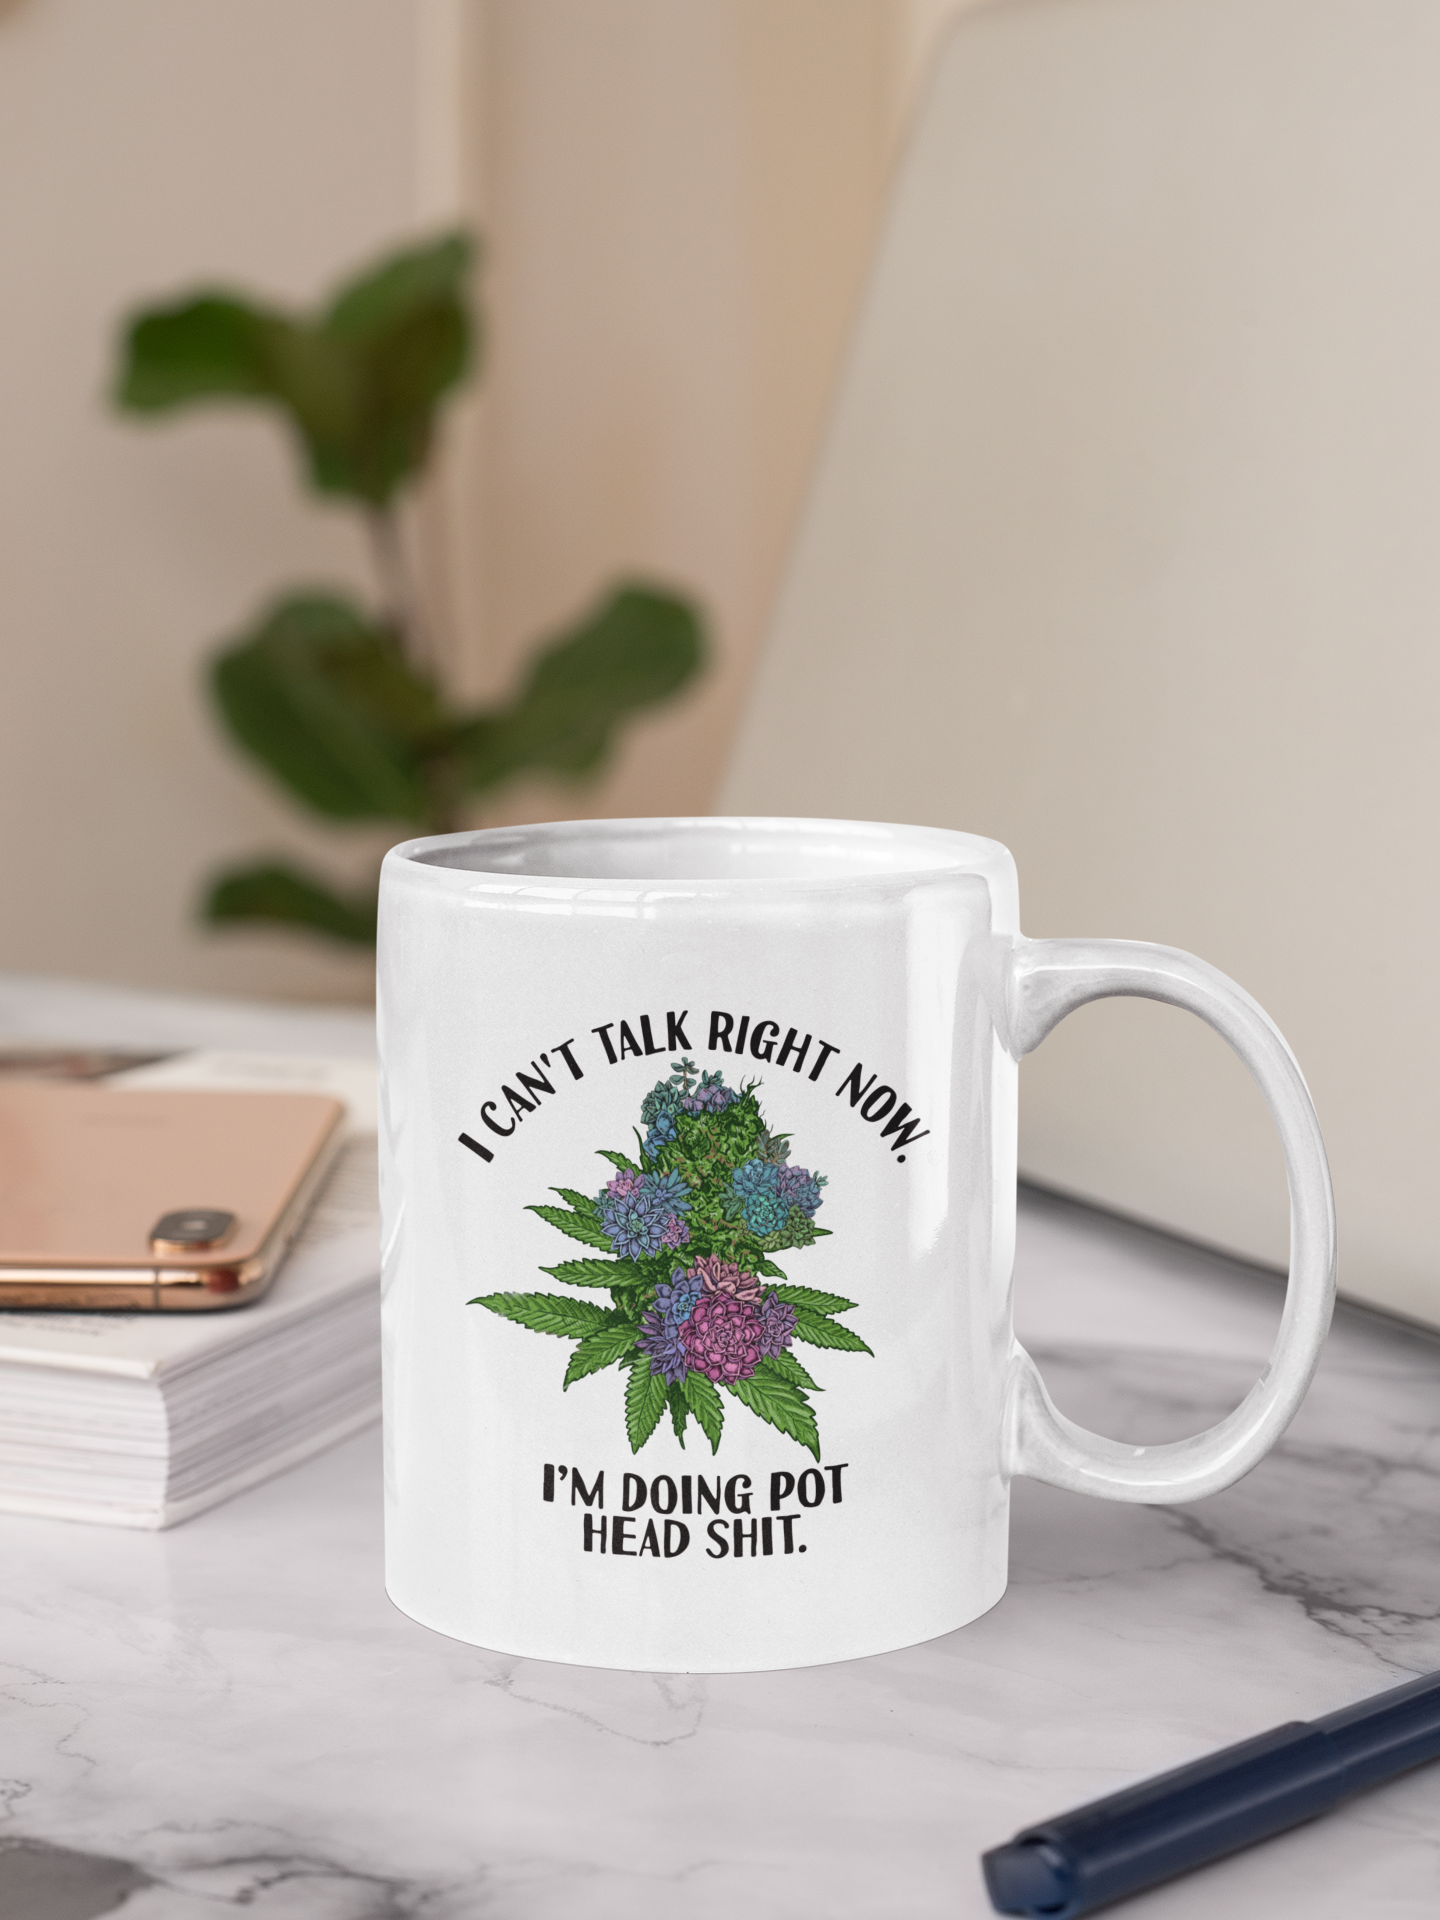 I can't talk right now I'm doing pot head shit mug